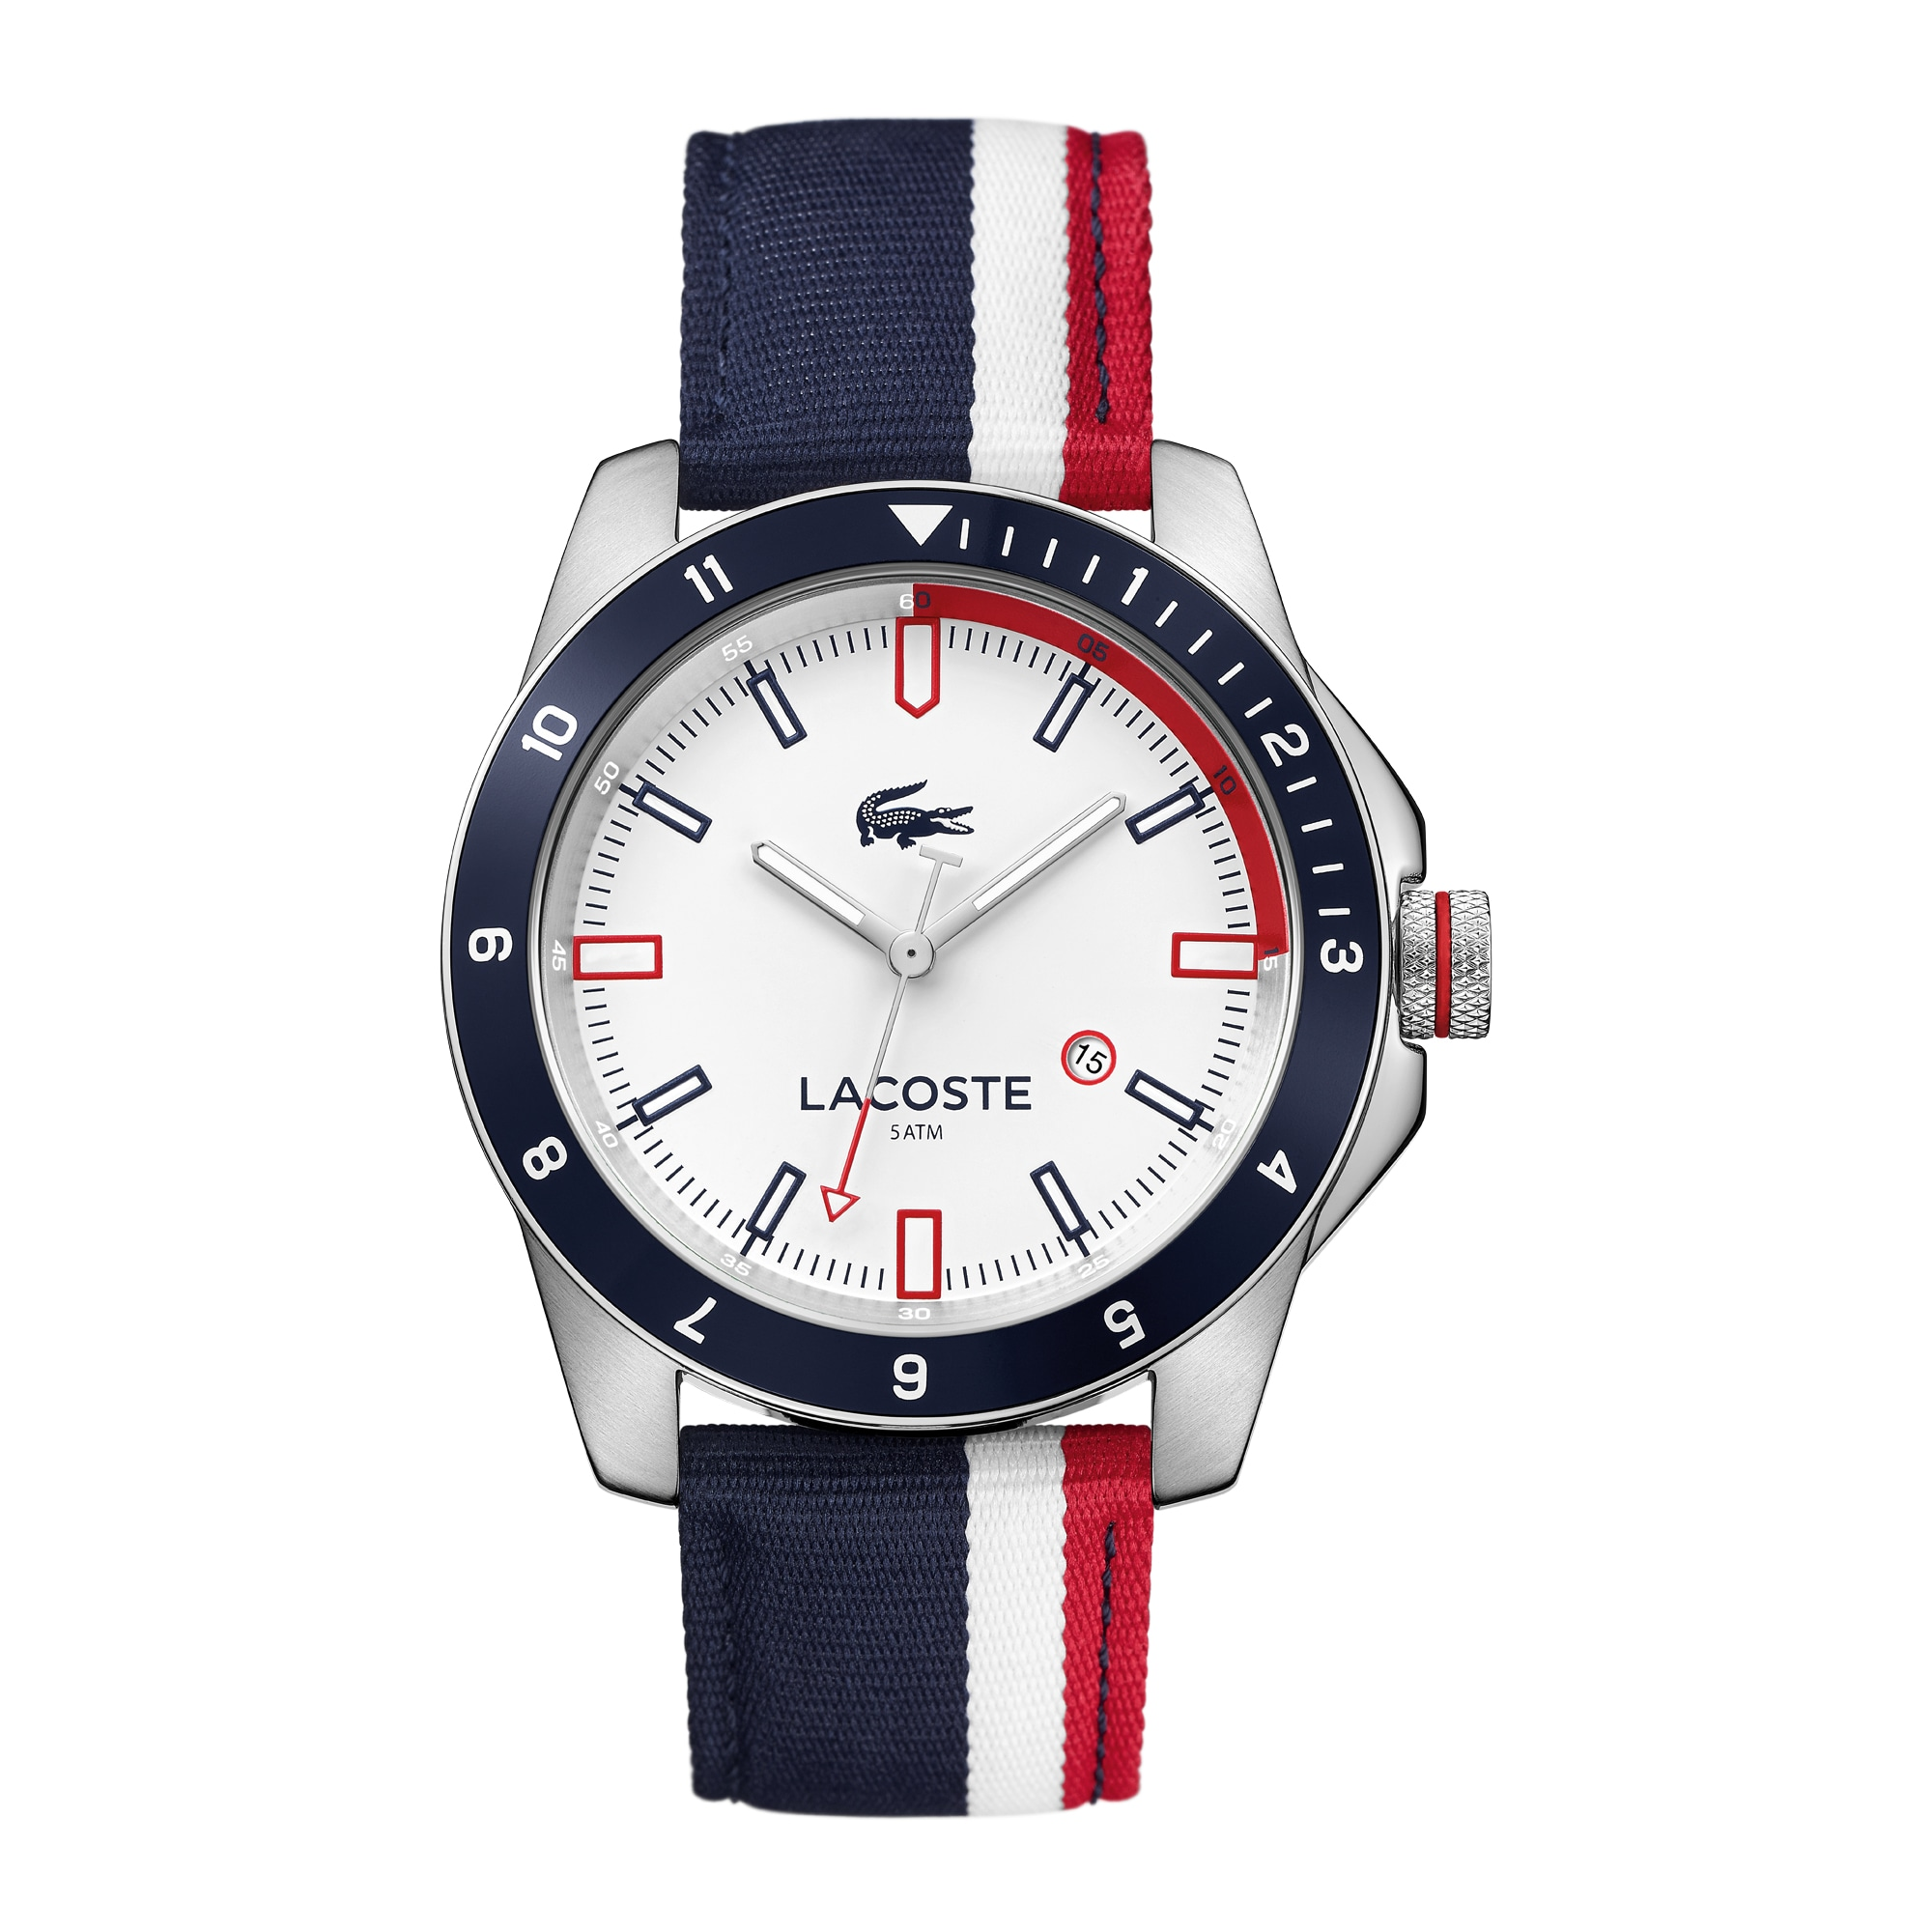 Men's Durban Red and White stripes Nylon Strap Watch